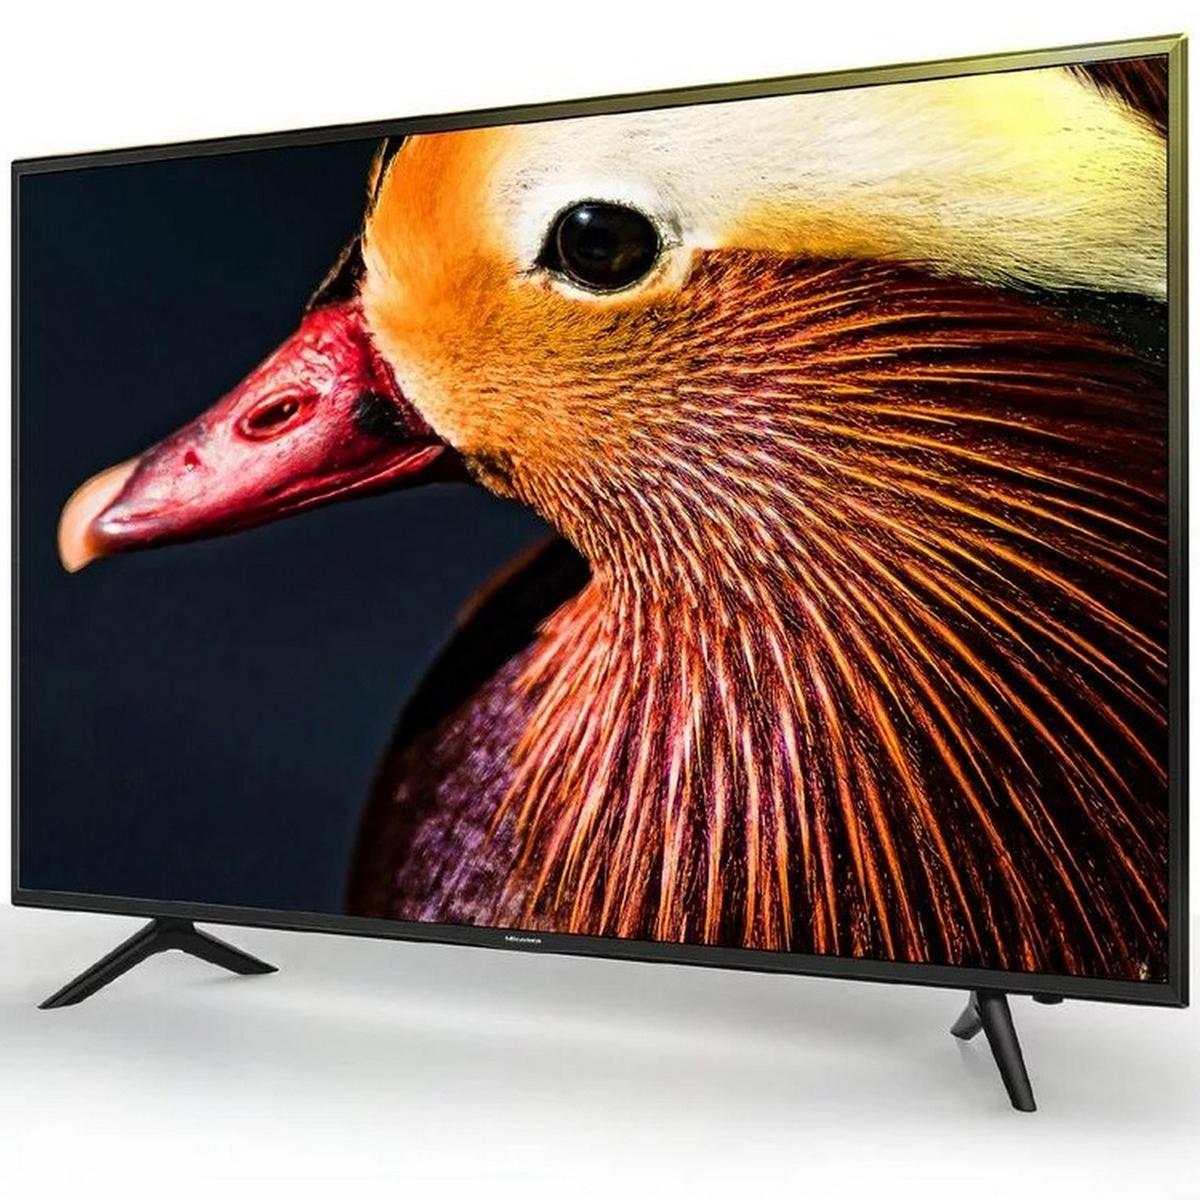 Buy Hisense Ultra HD Smart LED TV 55N3000UW 55inch - 44